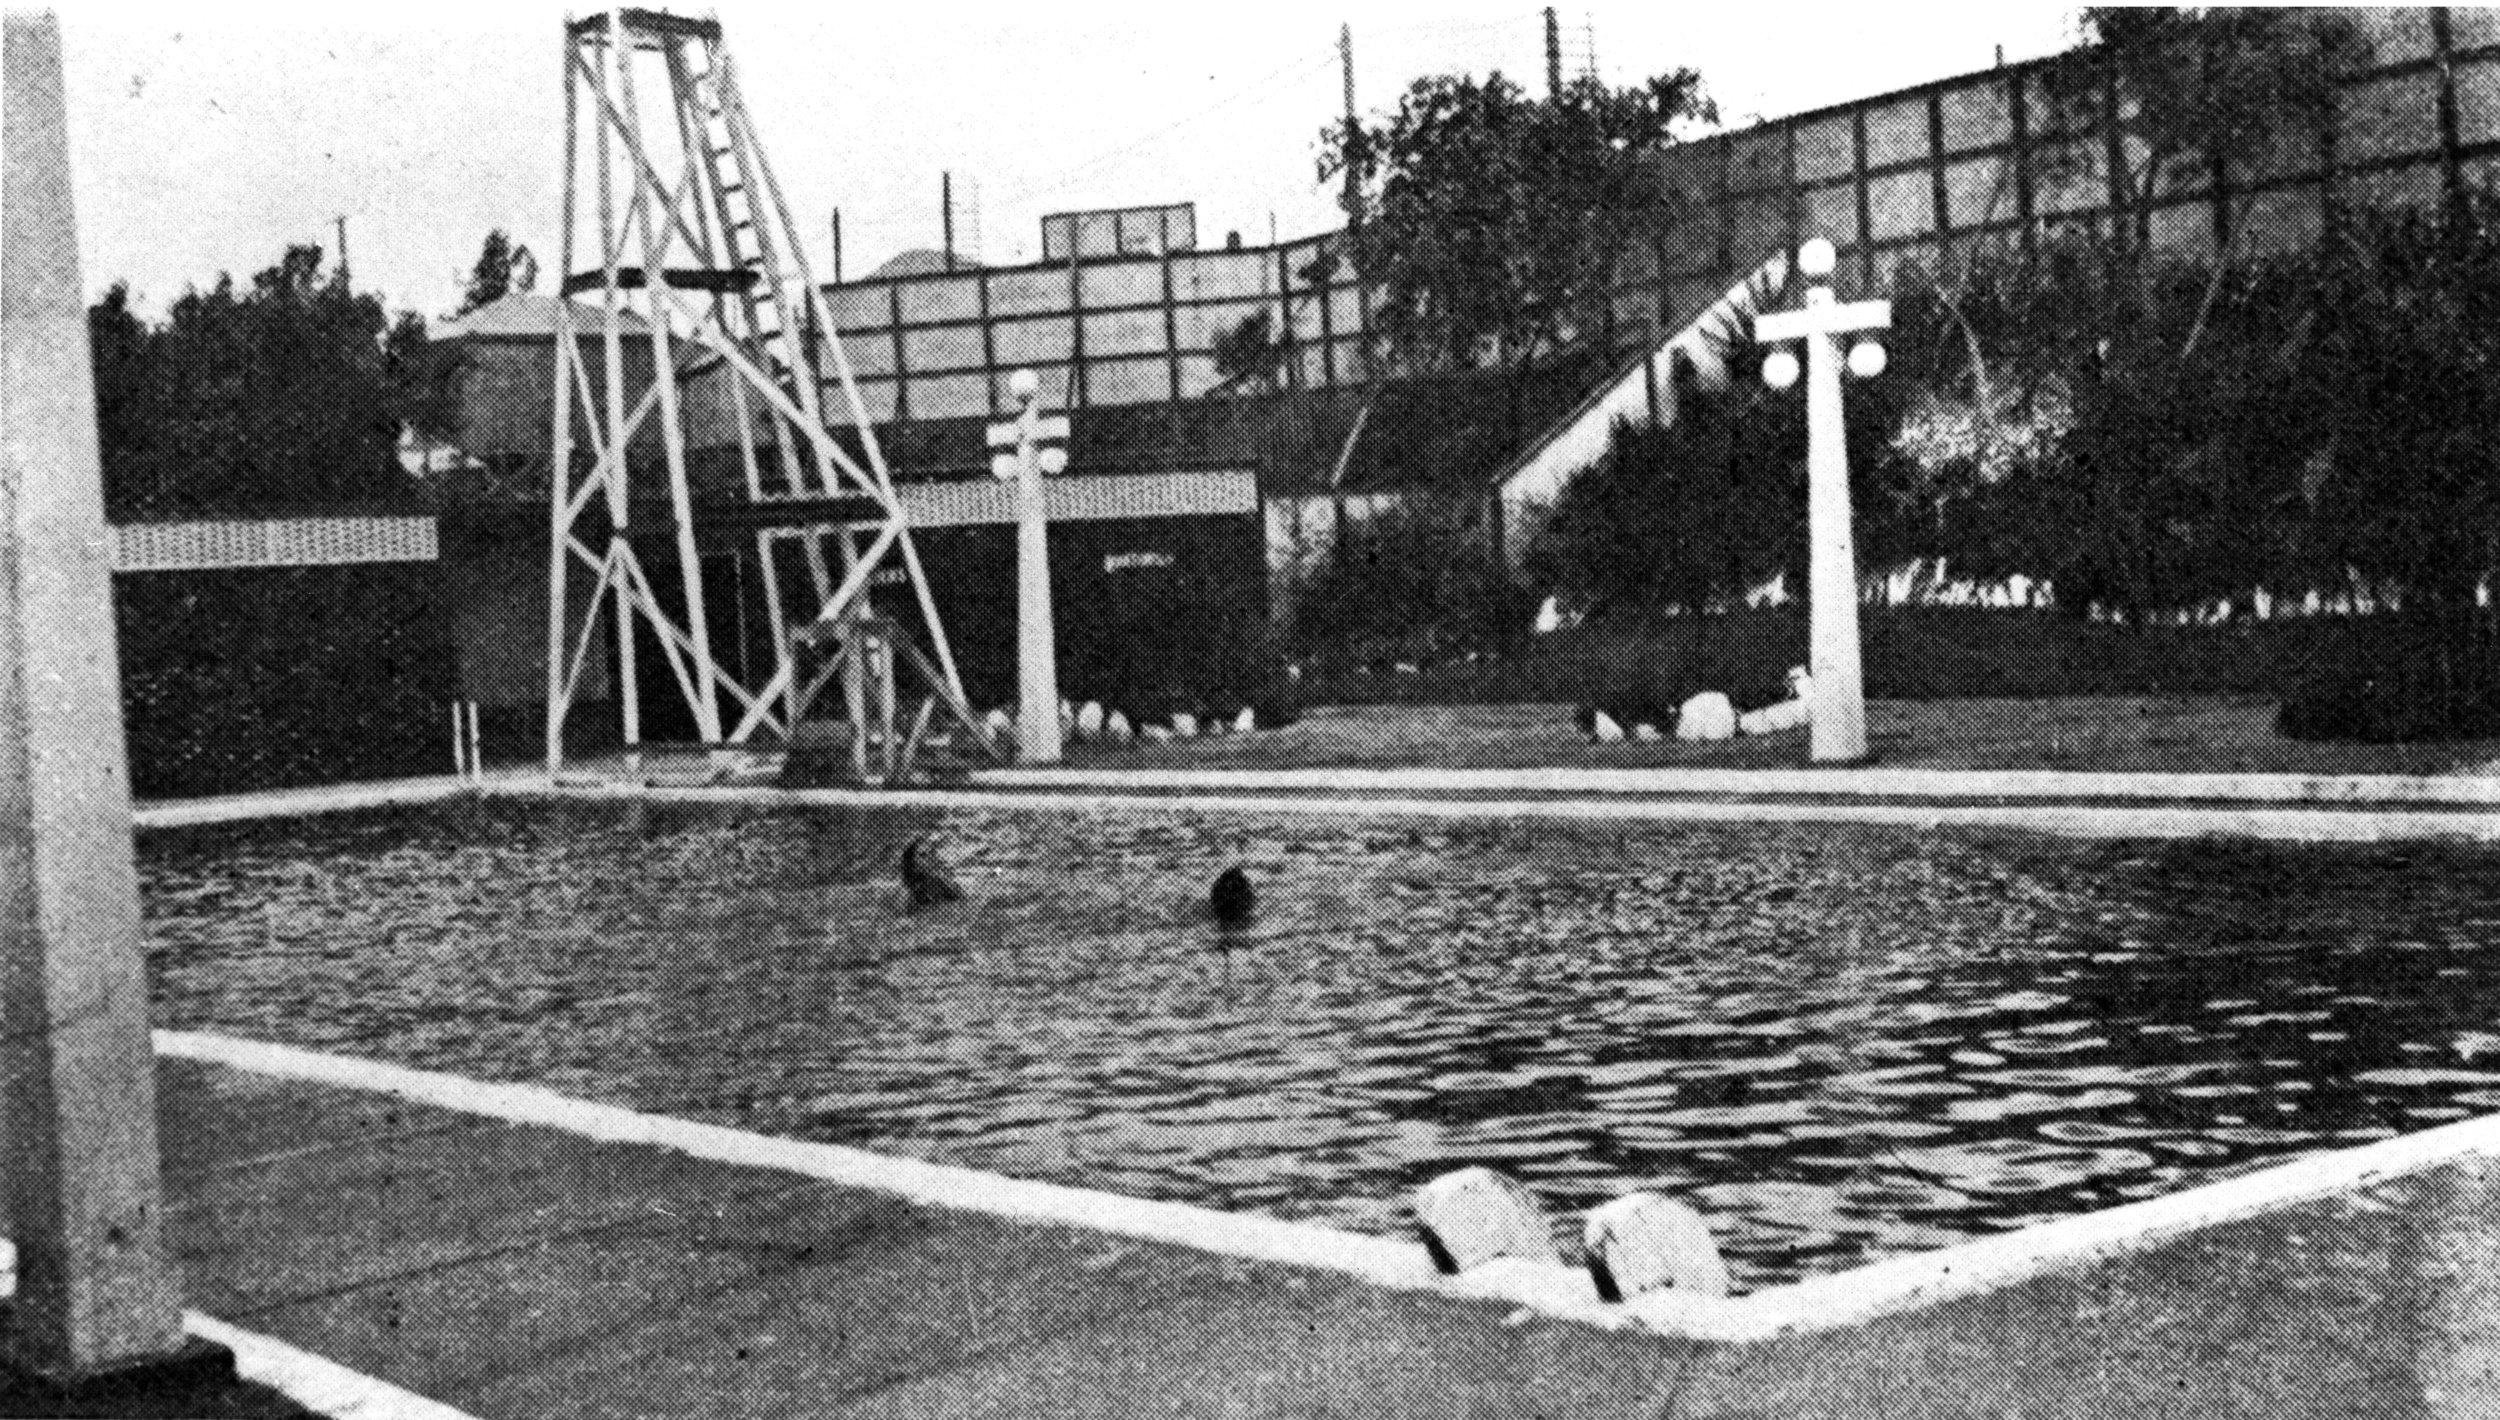 Swimming pool at Paddington, Brisbane, ca 1917, photograph courtesy of SLA, neg no 67703